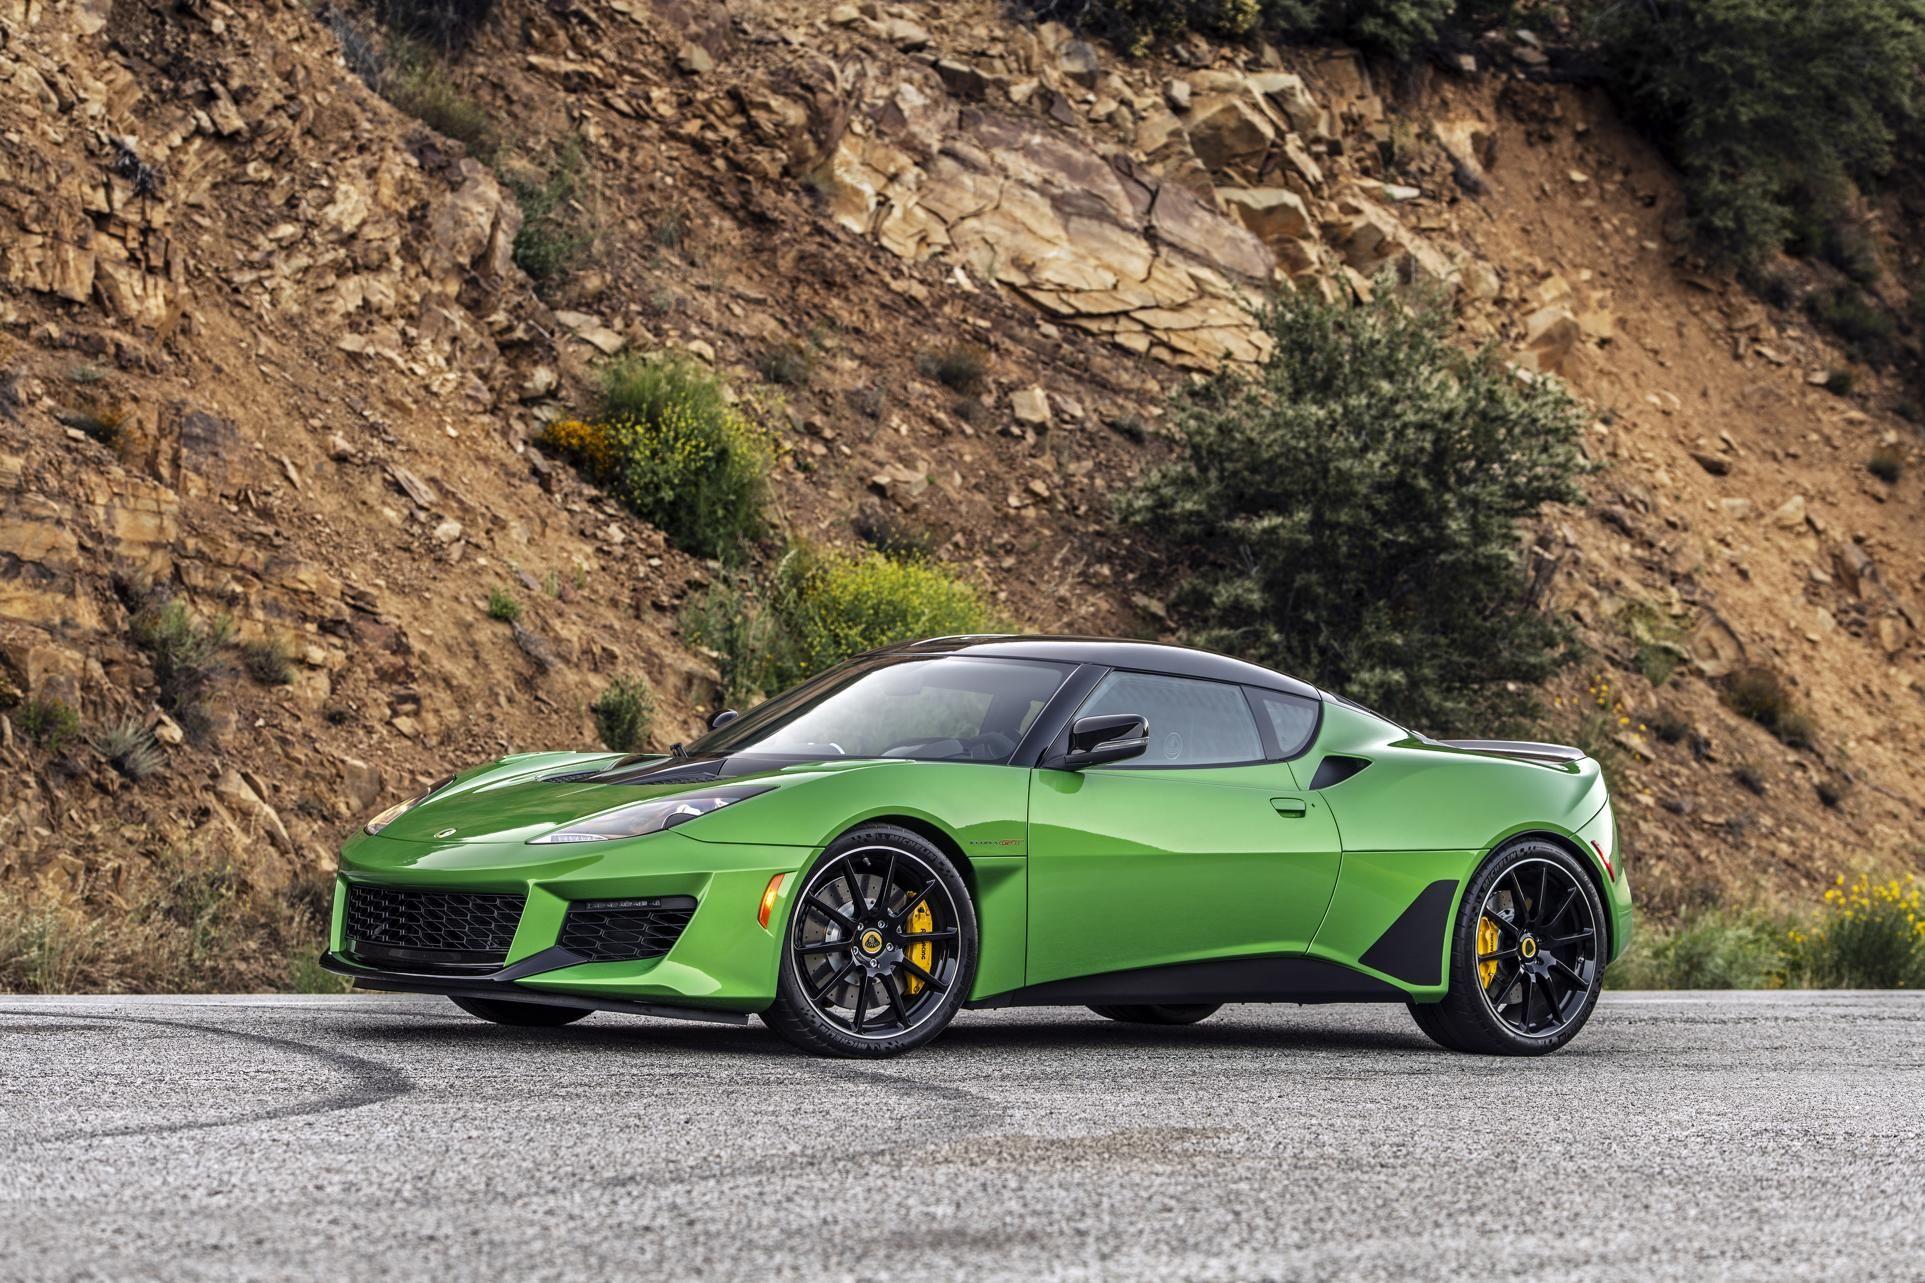 2020 Lotus Evora Gt Review The Anti Modern Sports Car Car Sports Car Evora